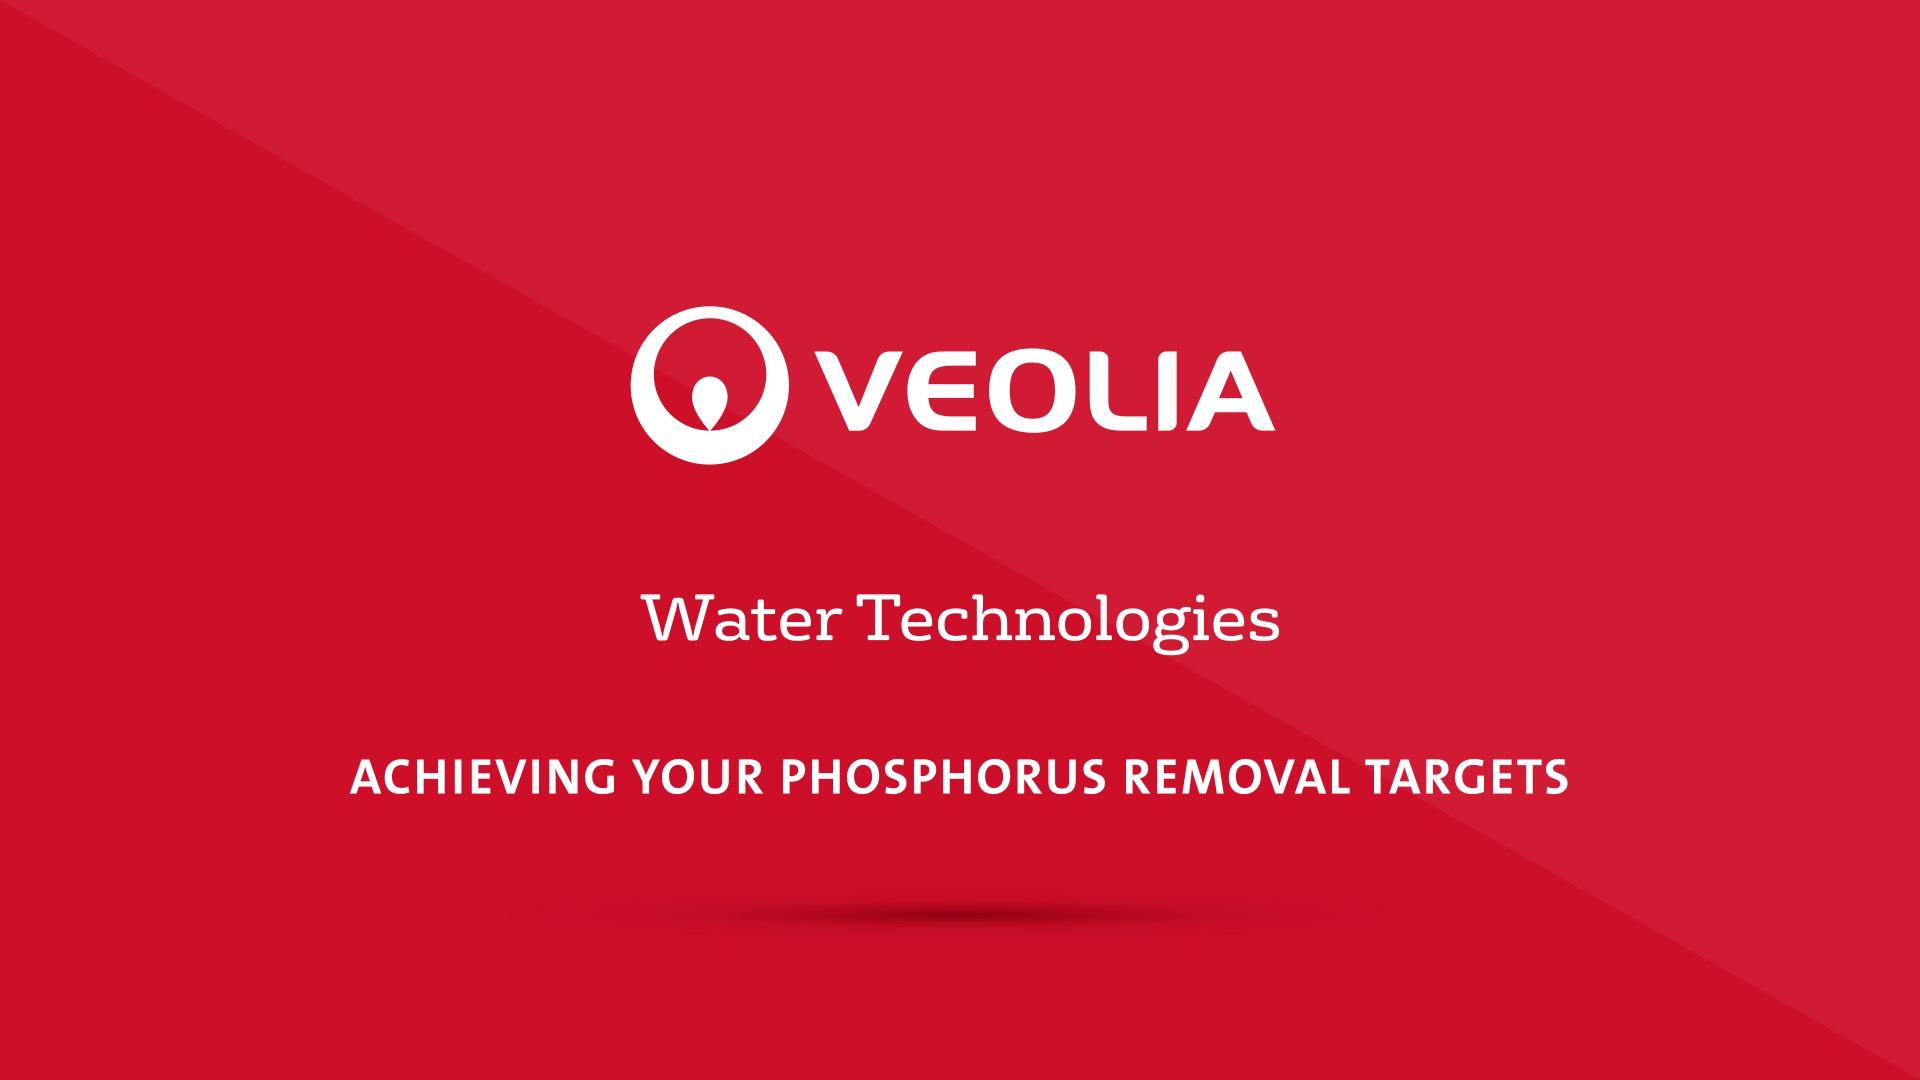 VEO_Phosphorus_Video_1_v5_FINAL